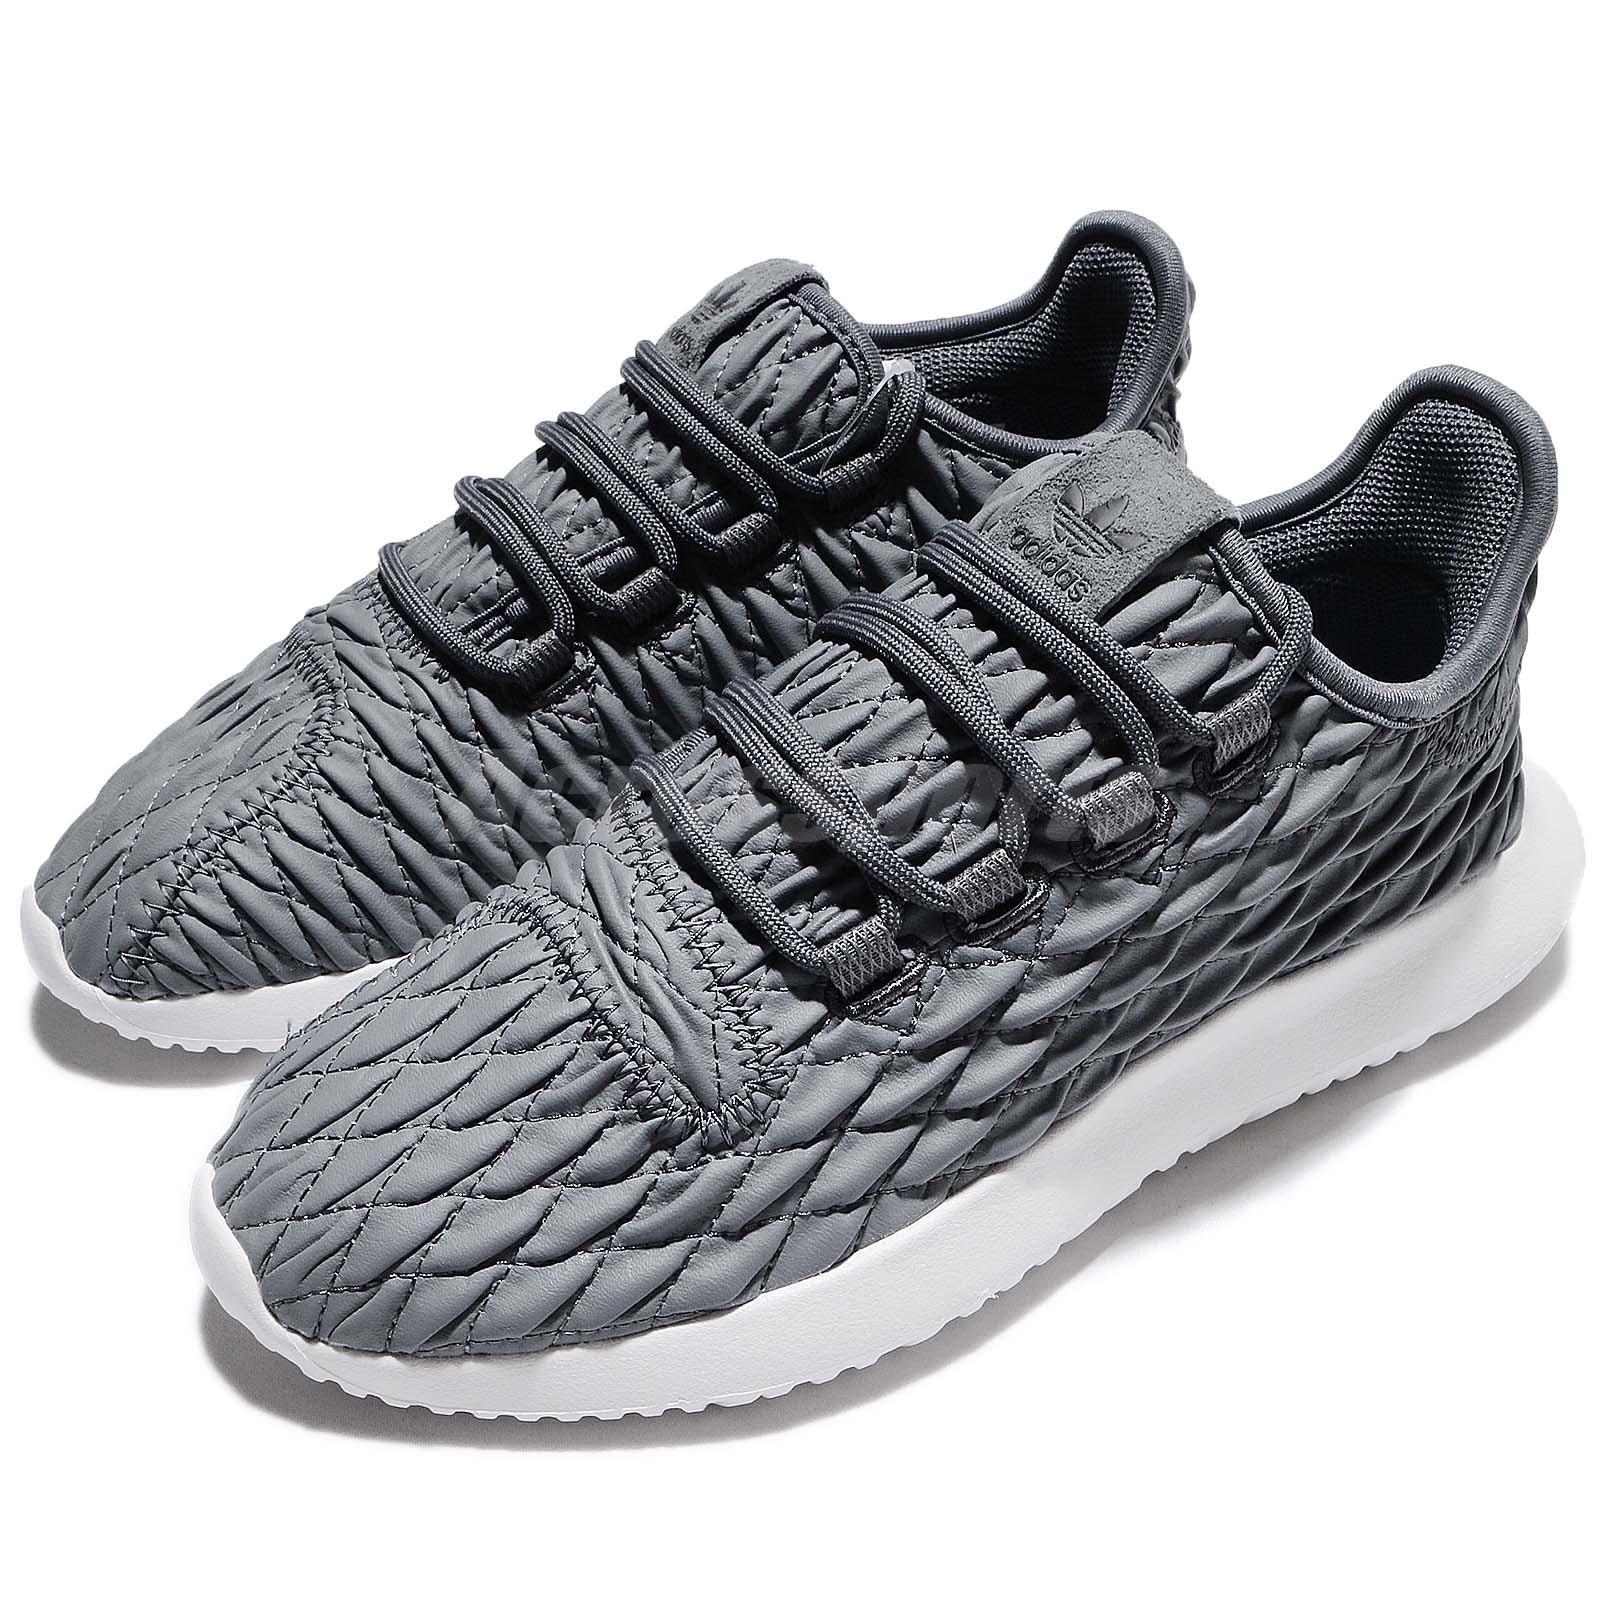 wholesale dealer beb1b c600a Details about adidas Originals Tubular New Runner Shadow W Grey Diamond  Pattern Women BB8868